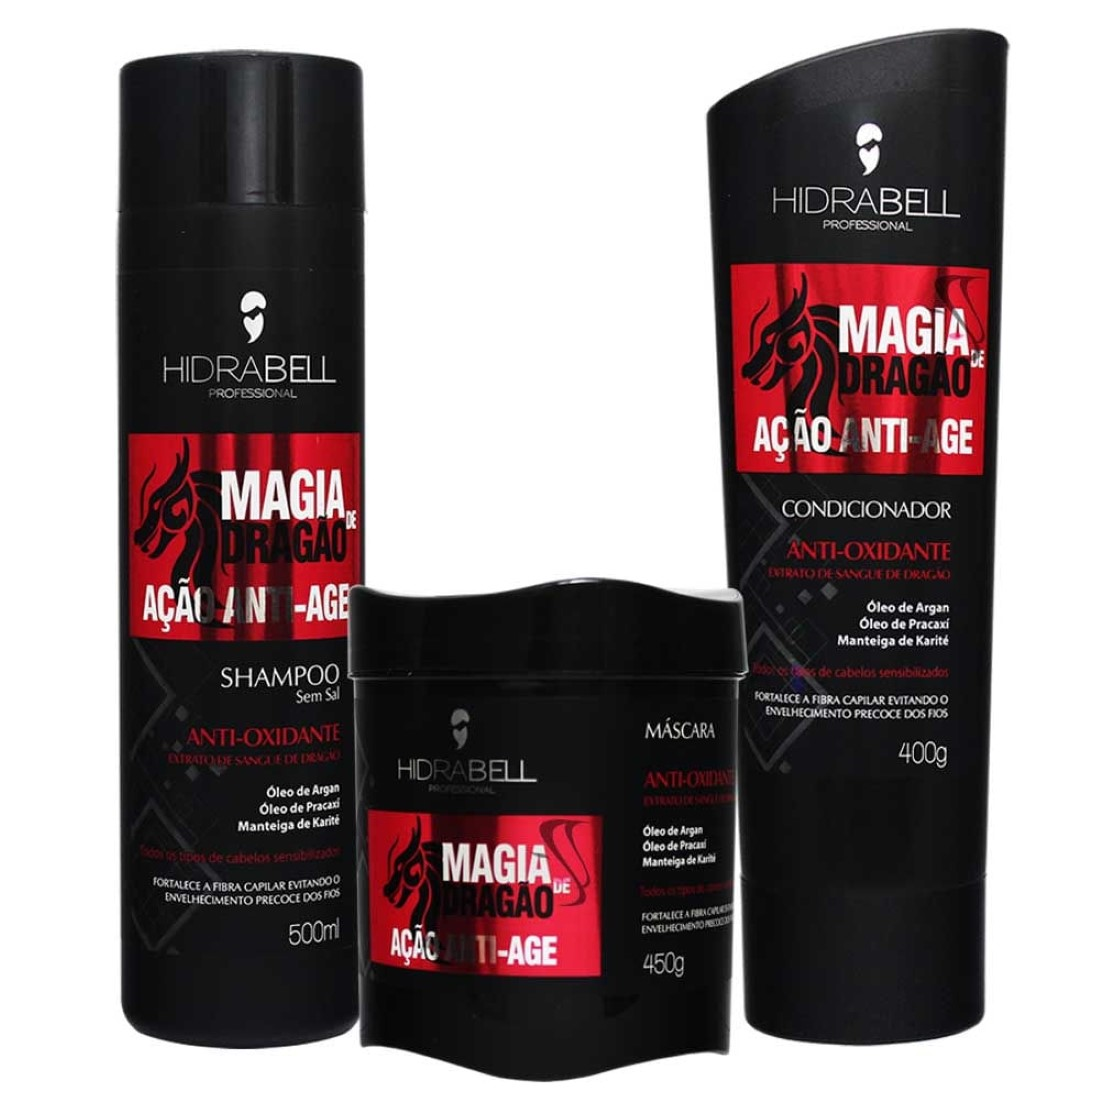 Kit Shampoo Condicionador e Máscara Magia de Dragão - Hidrabell